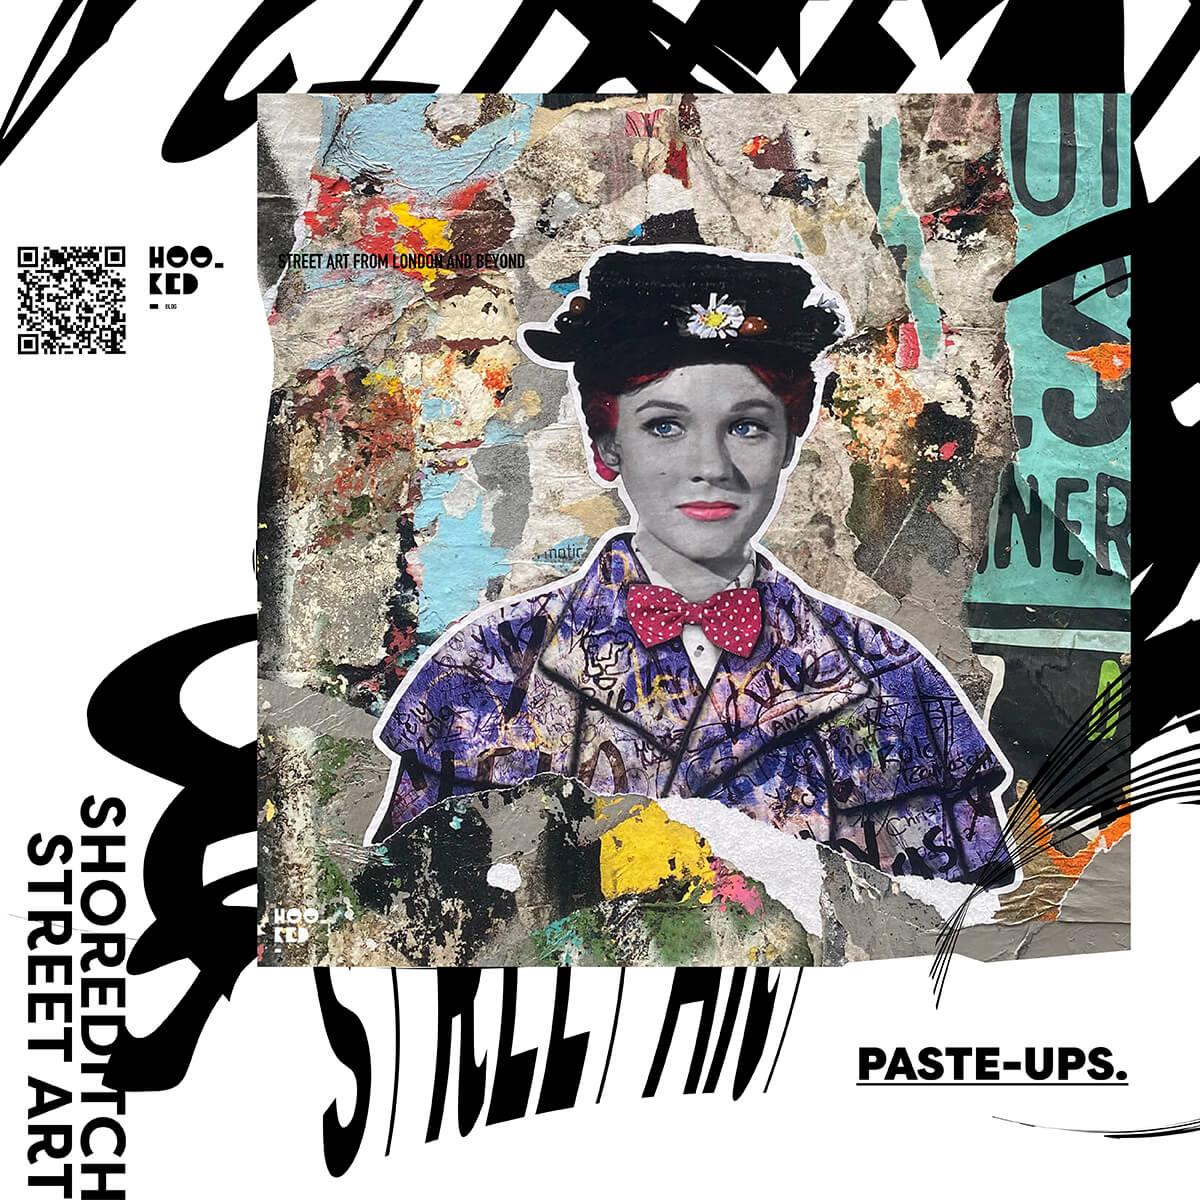 Five London Street Art Hotspots for Paste-ups